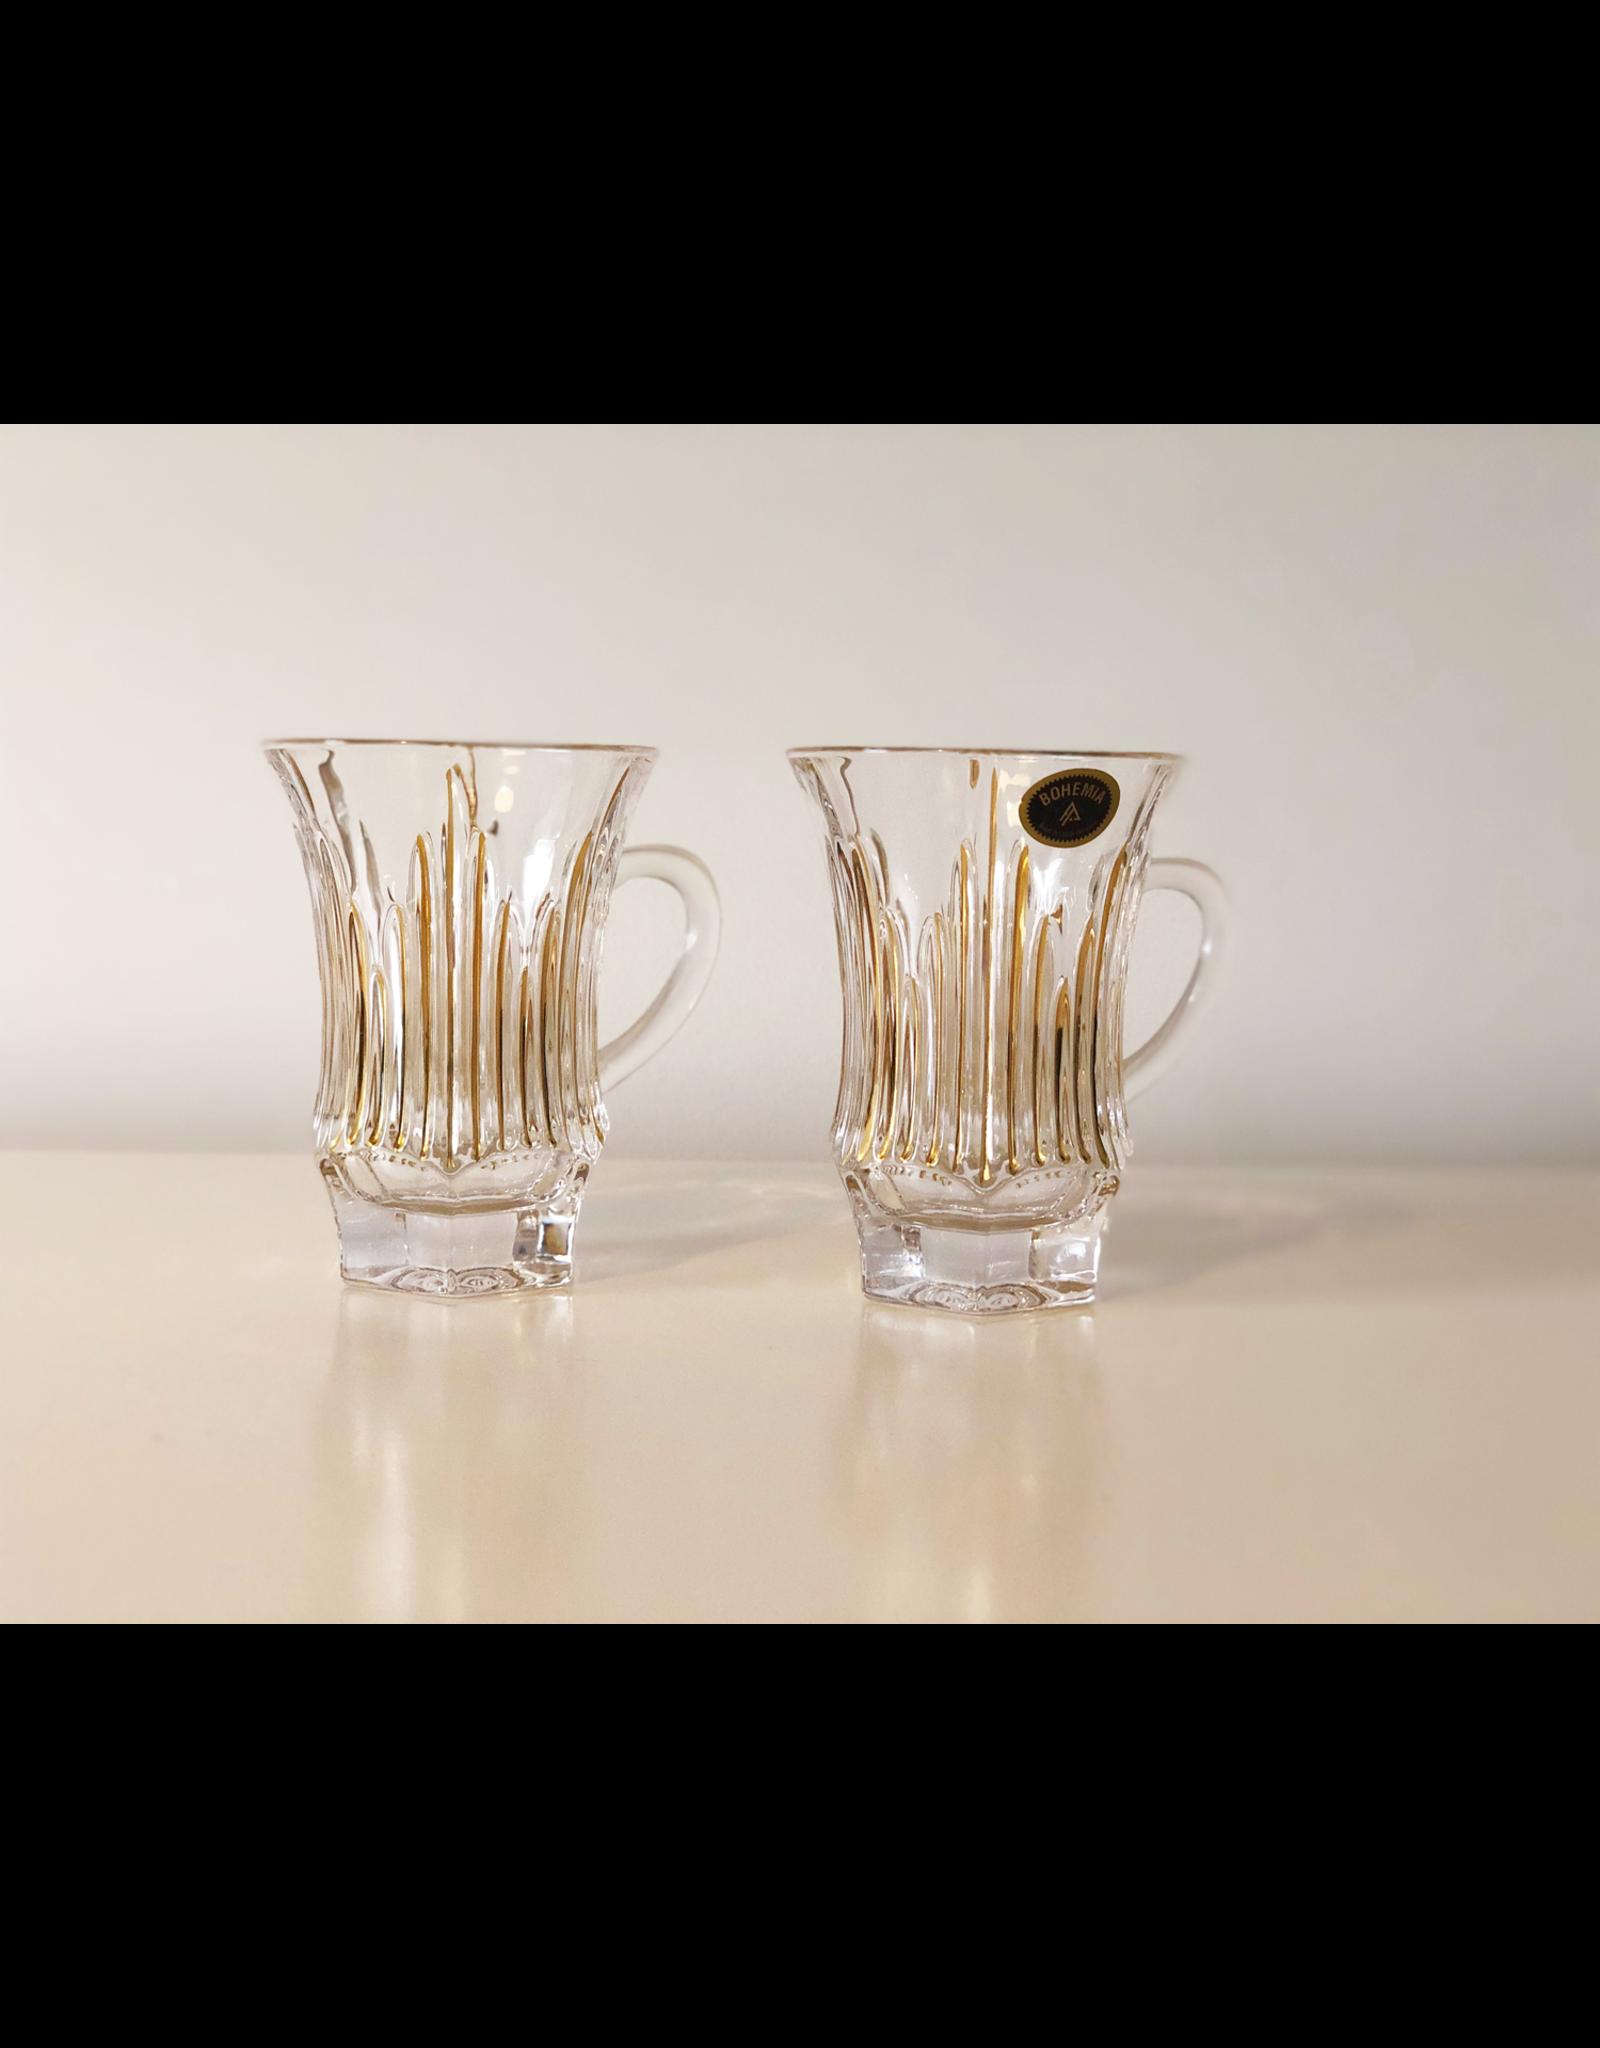 Skloglass Parma theeglazen Goud / 6st